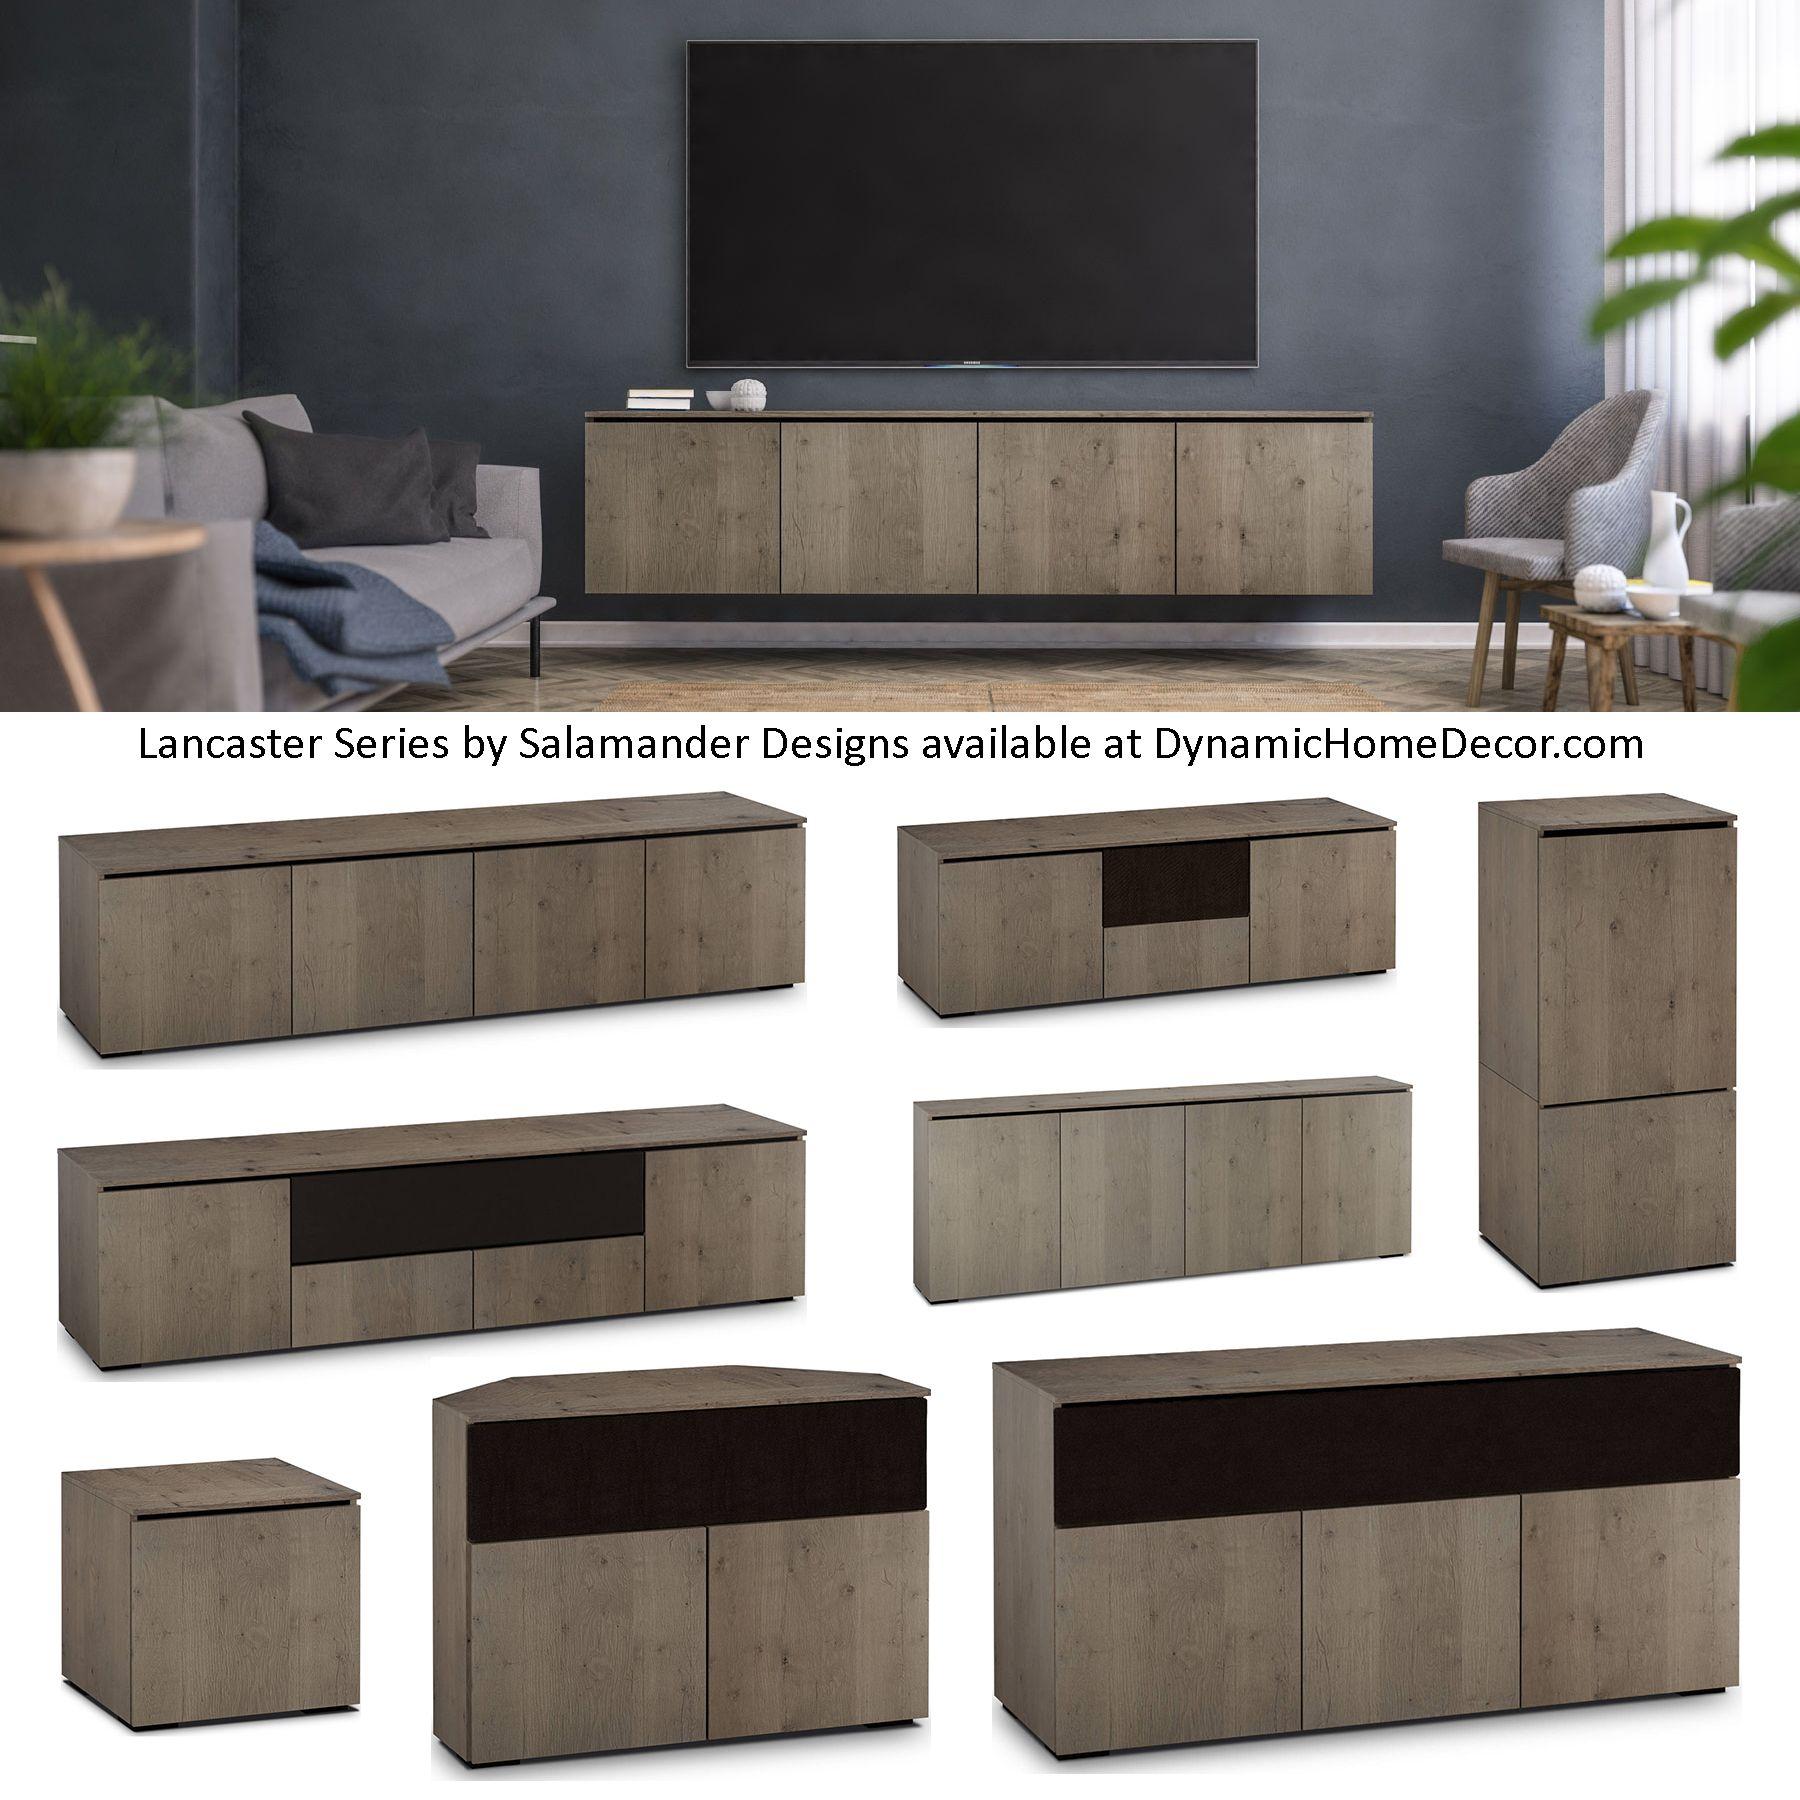 Salamander Designs At Dynamic Home Decor Modern Furniture Decor